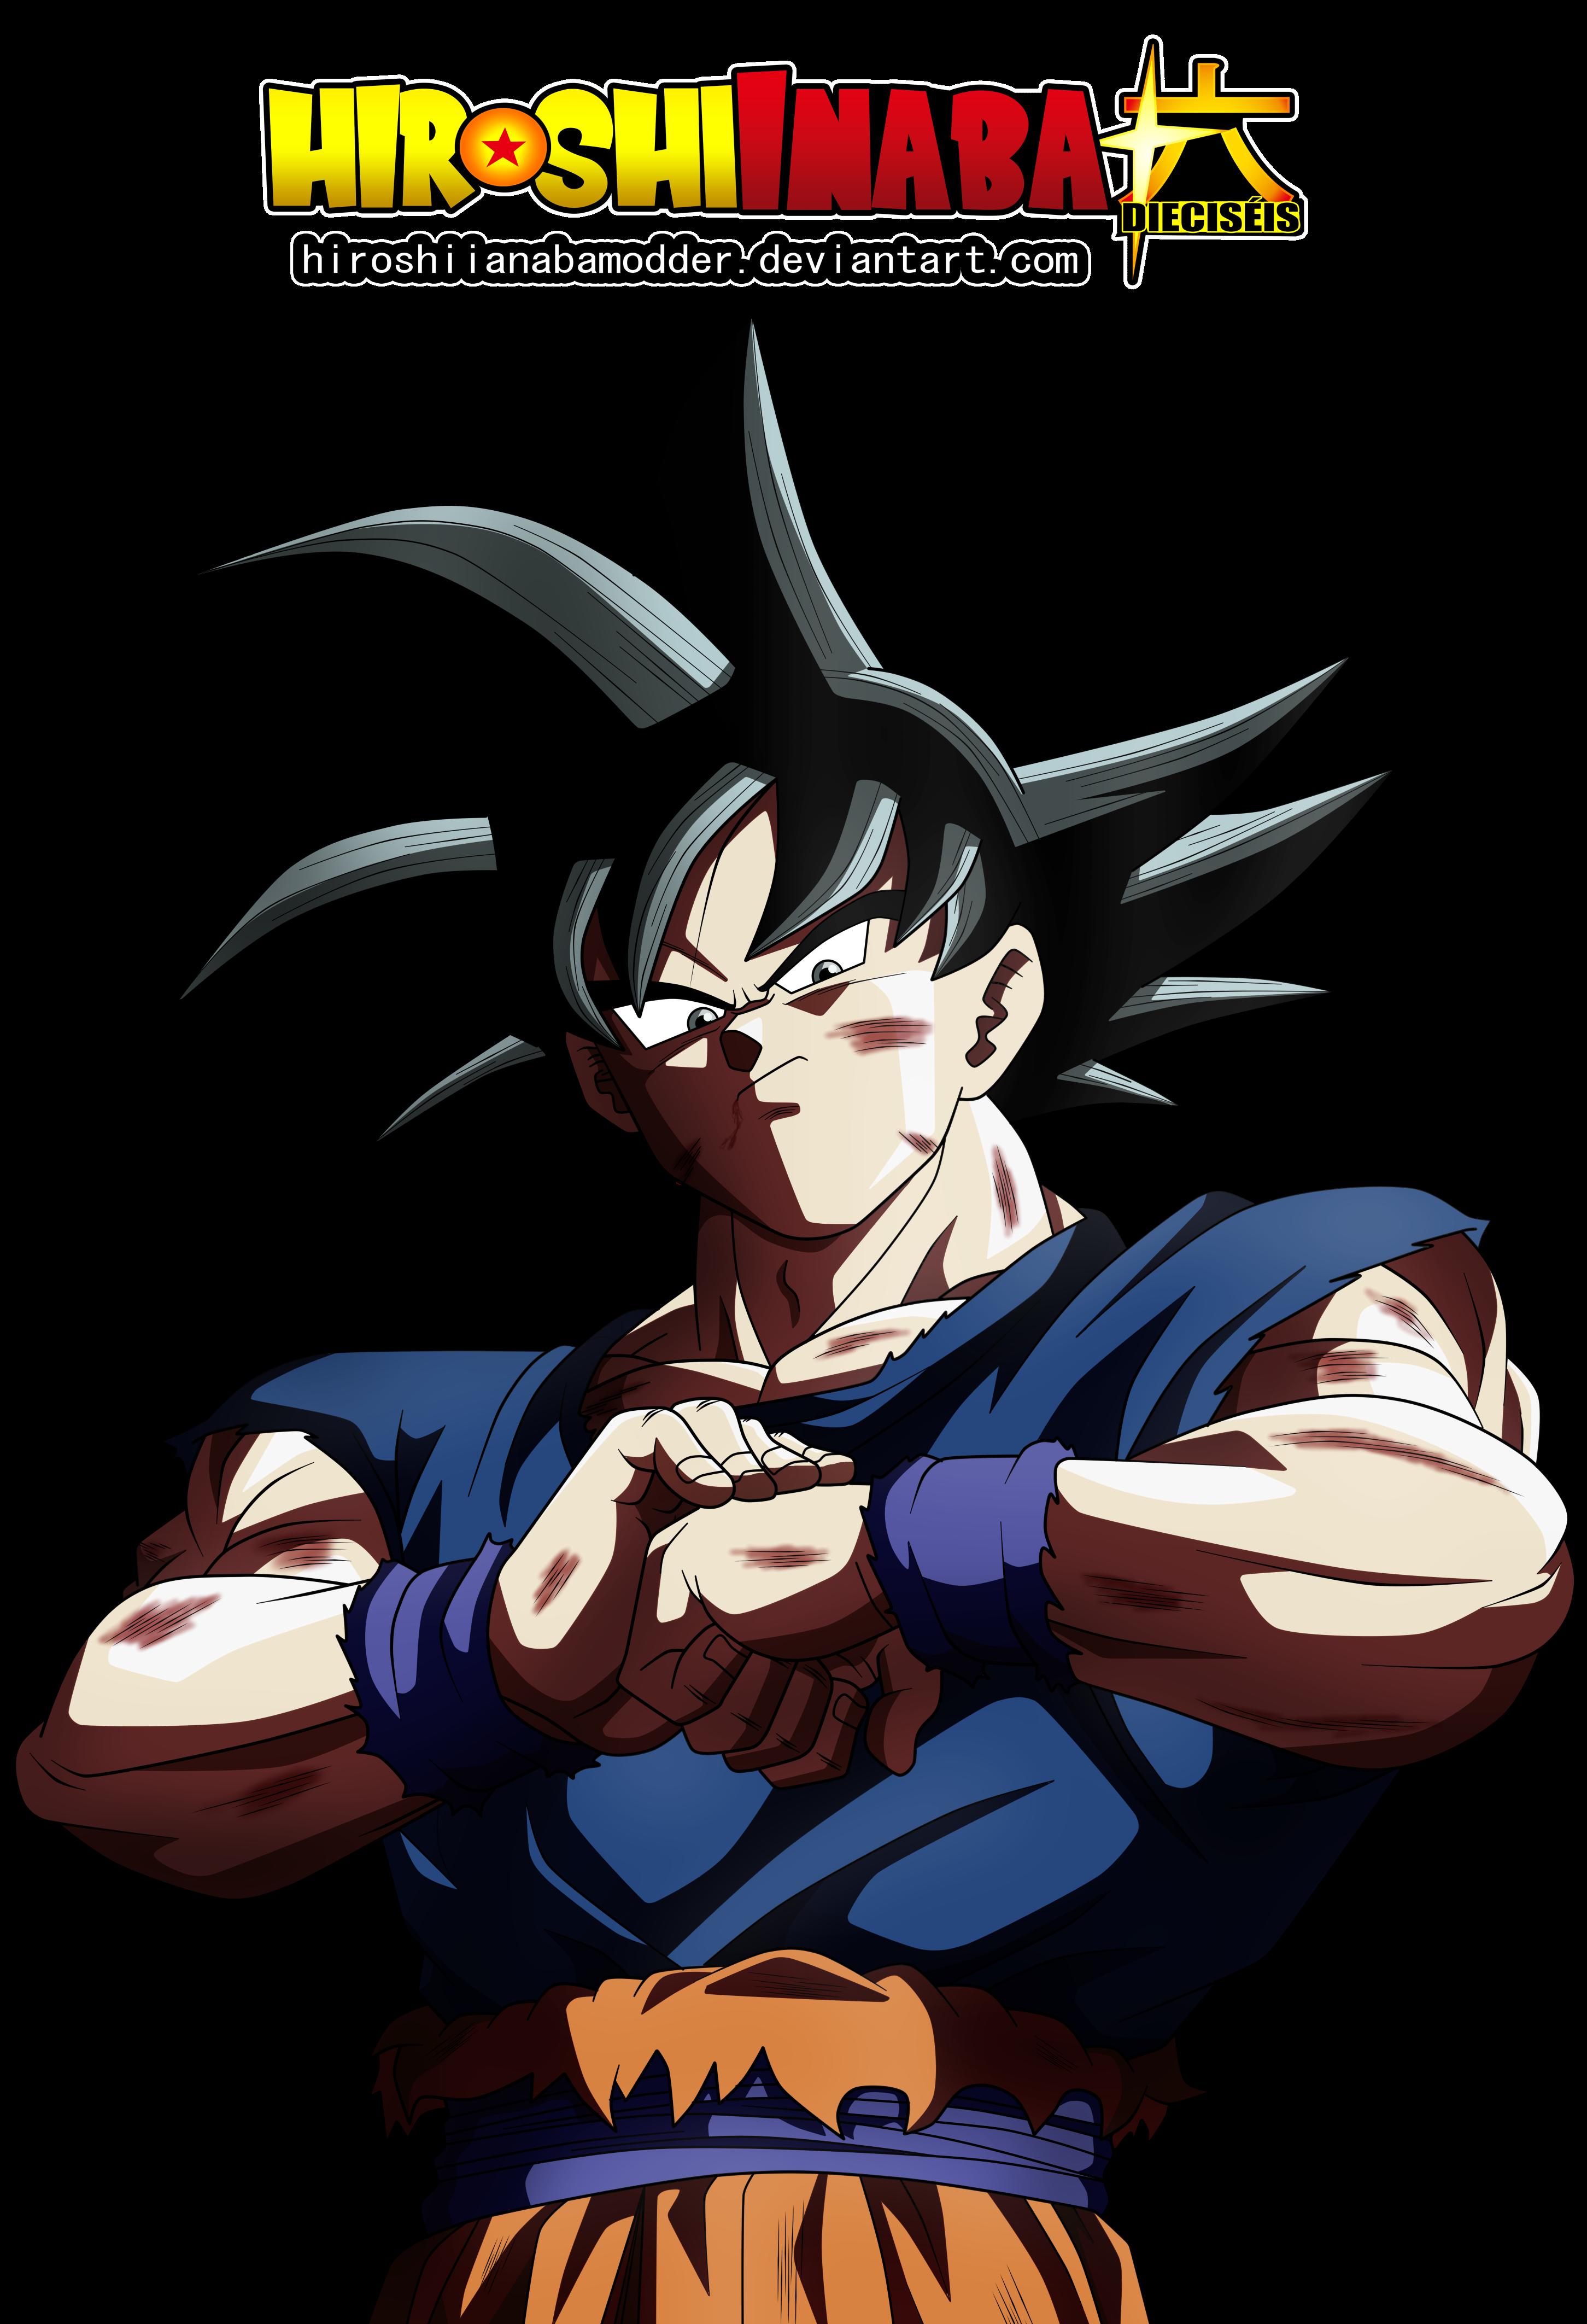 Goku migatte no gokui clipart clipart free library Resultado de imagen para migatte no gokui | chico | Dragon ball gt ... clipart free library